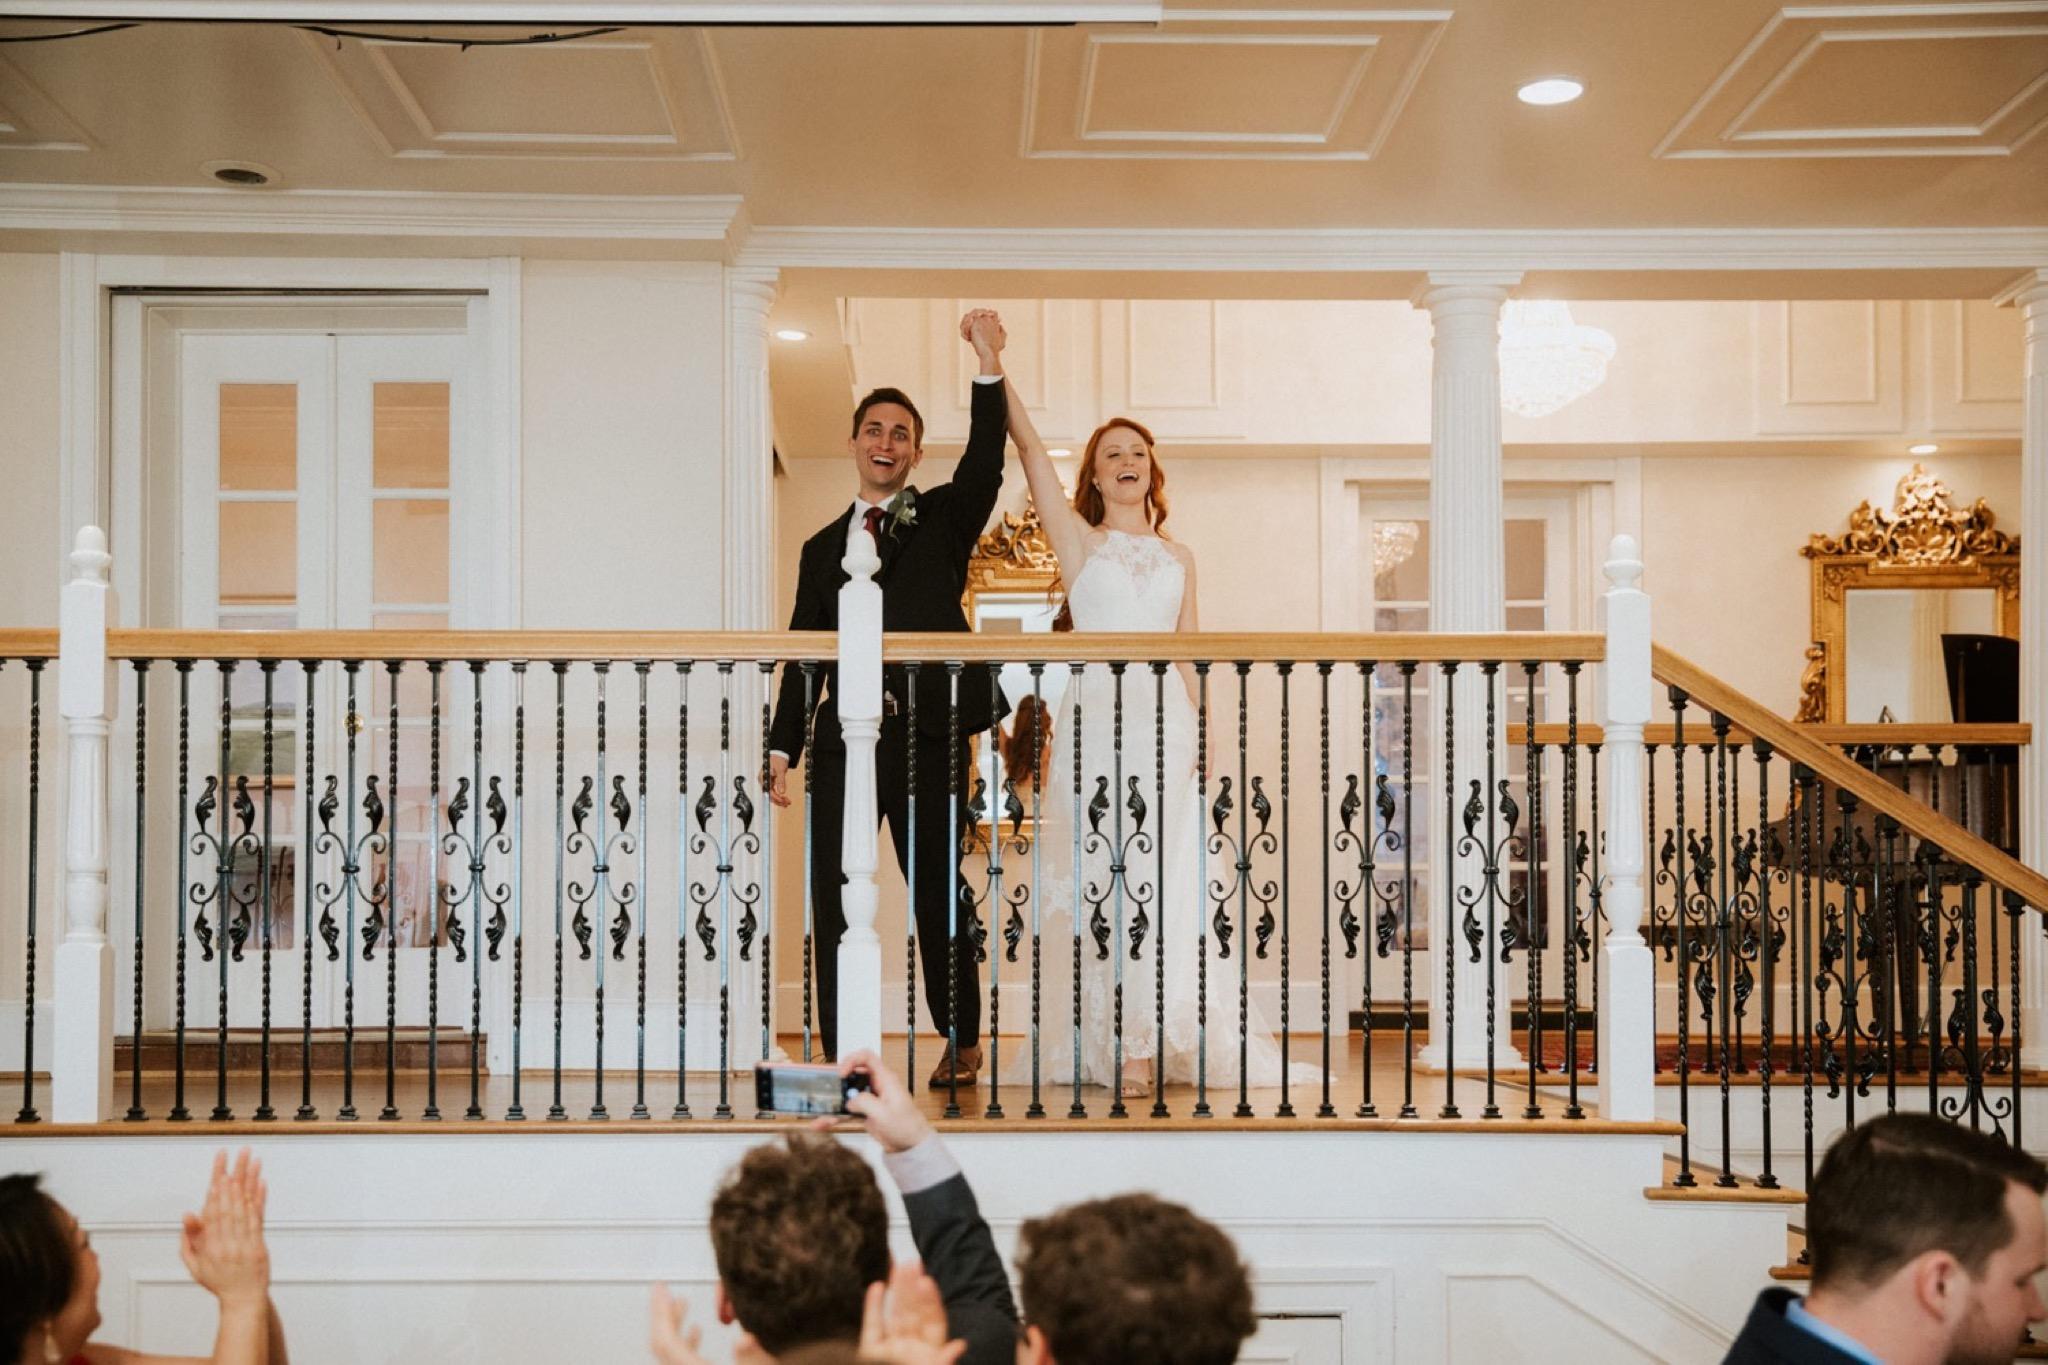 74_West Manor Estate Weddings - Pat Cori Photography-157_VirginiaWeddingPhotographer_WestManorEstate_Firstdance_Wedding.jpg